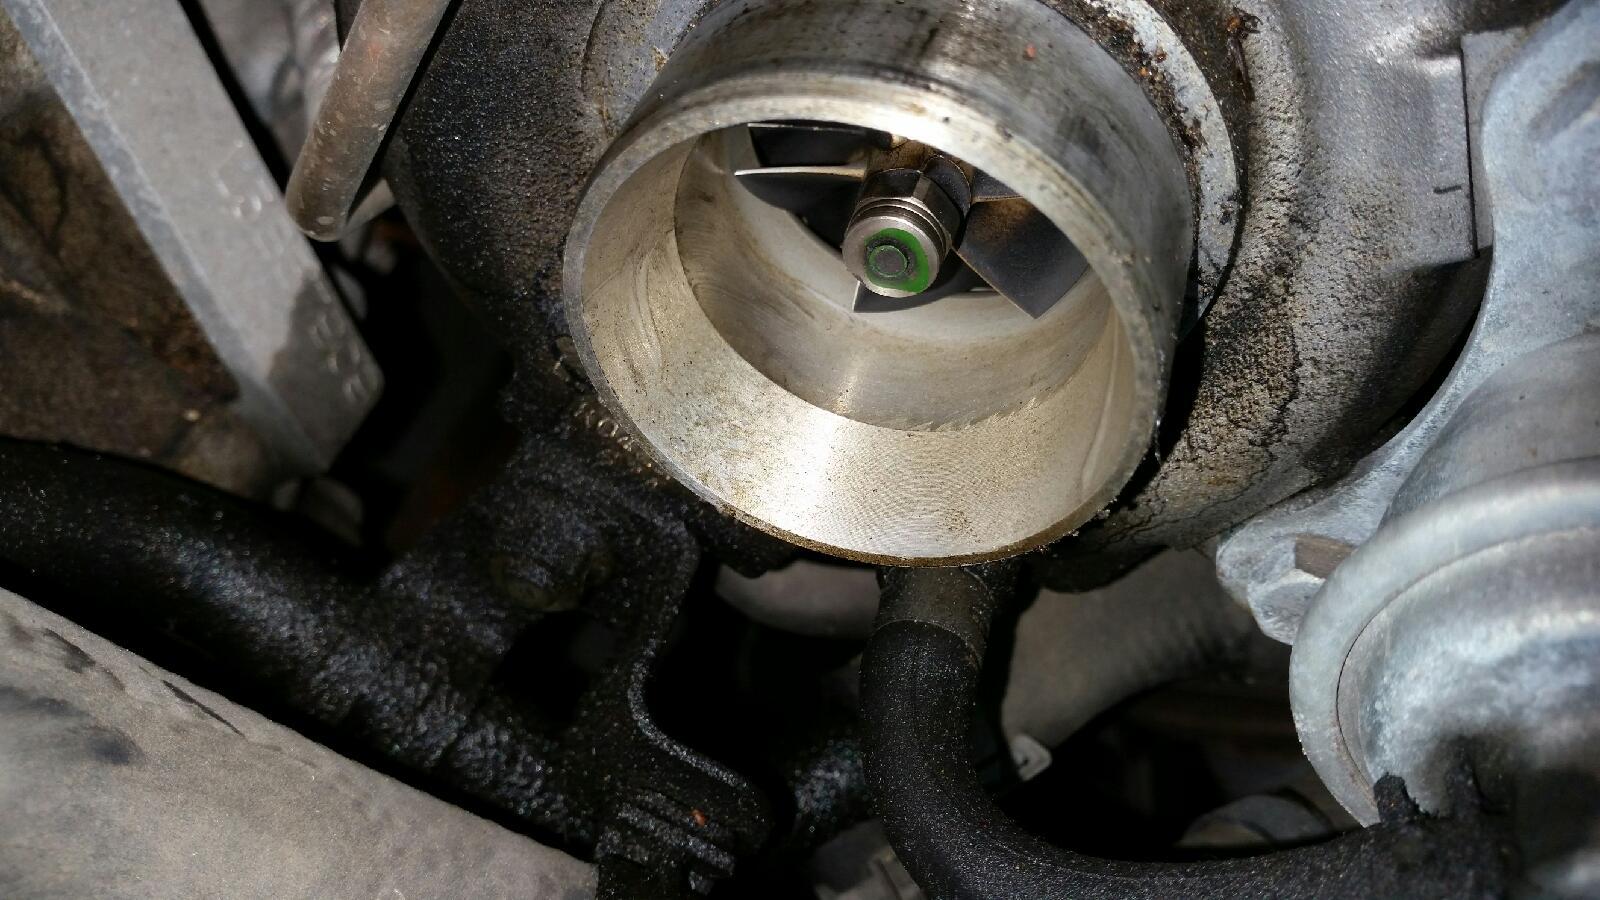 2007 mazda cx-7 vvt actuator noise